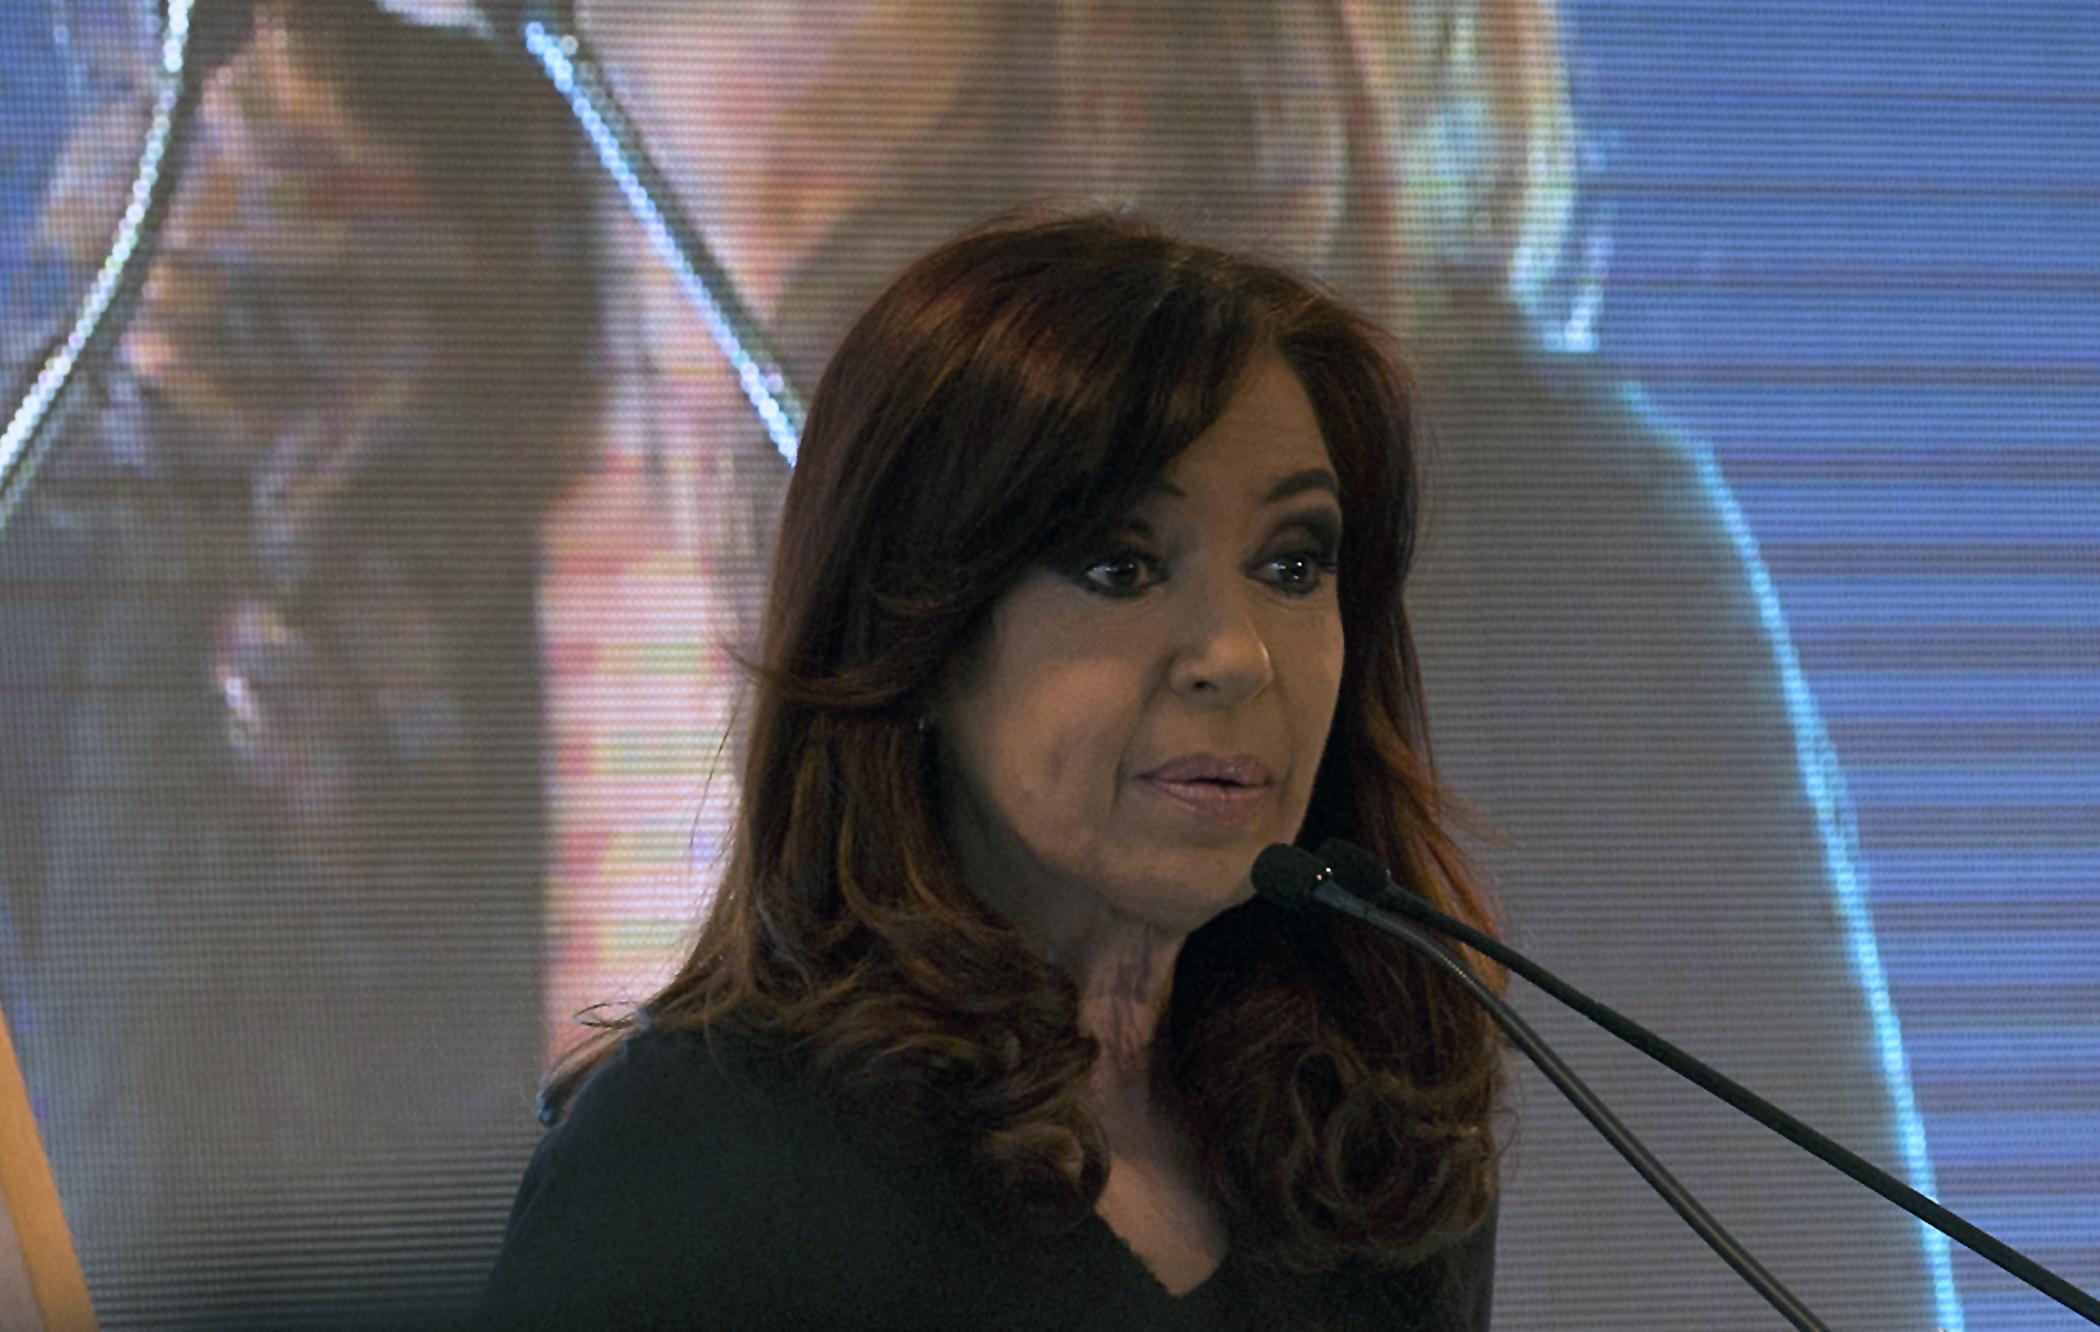 Presedintei Argentinei i s-a prescris o luna de repaos, In urma unui traumatism cranian